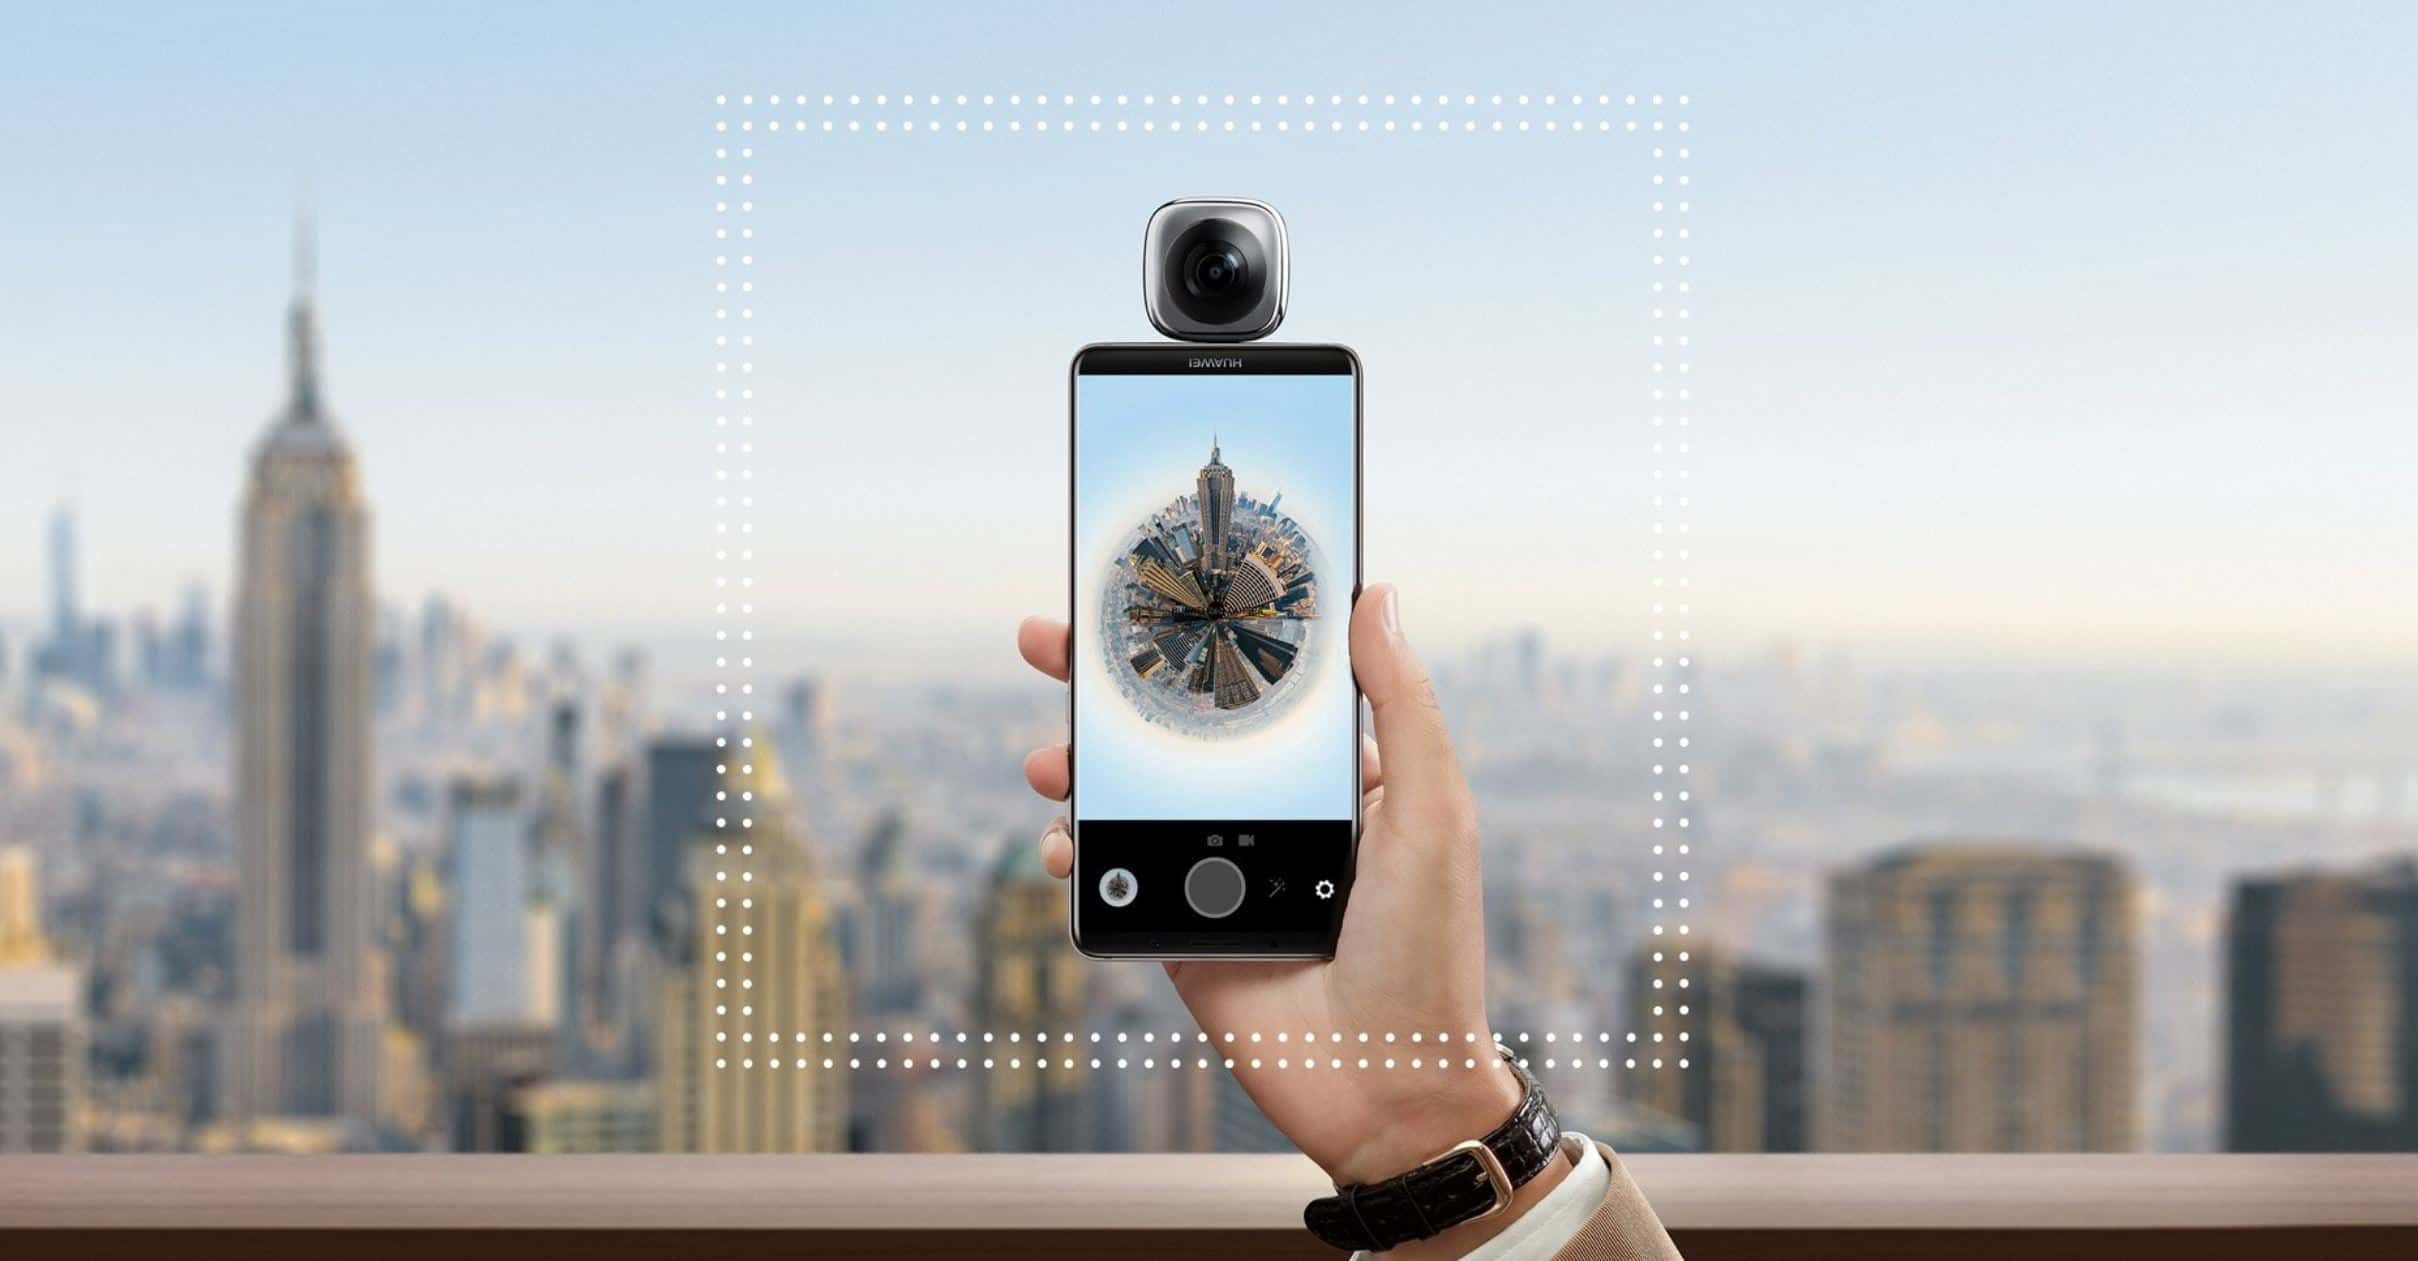 EnVizion 360 Camera Huawei Promo 1